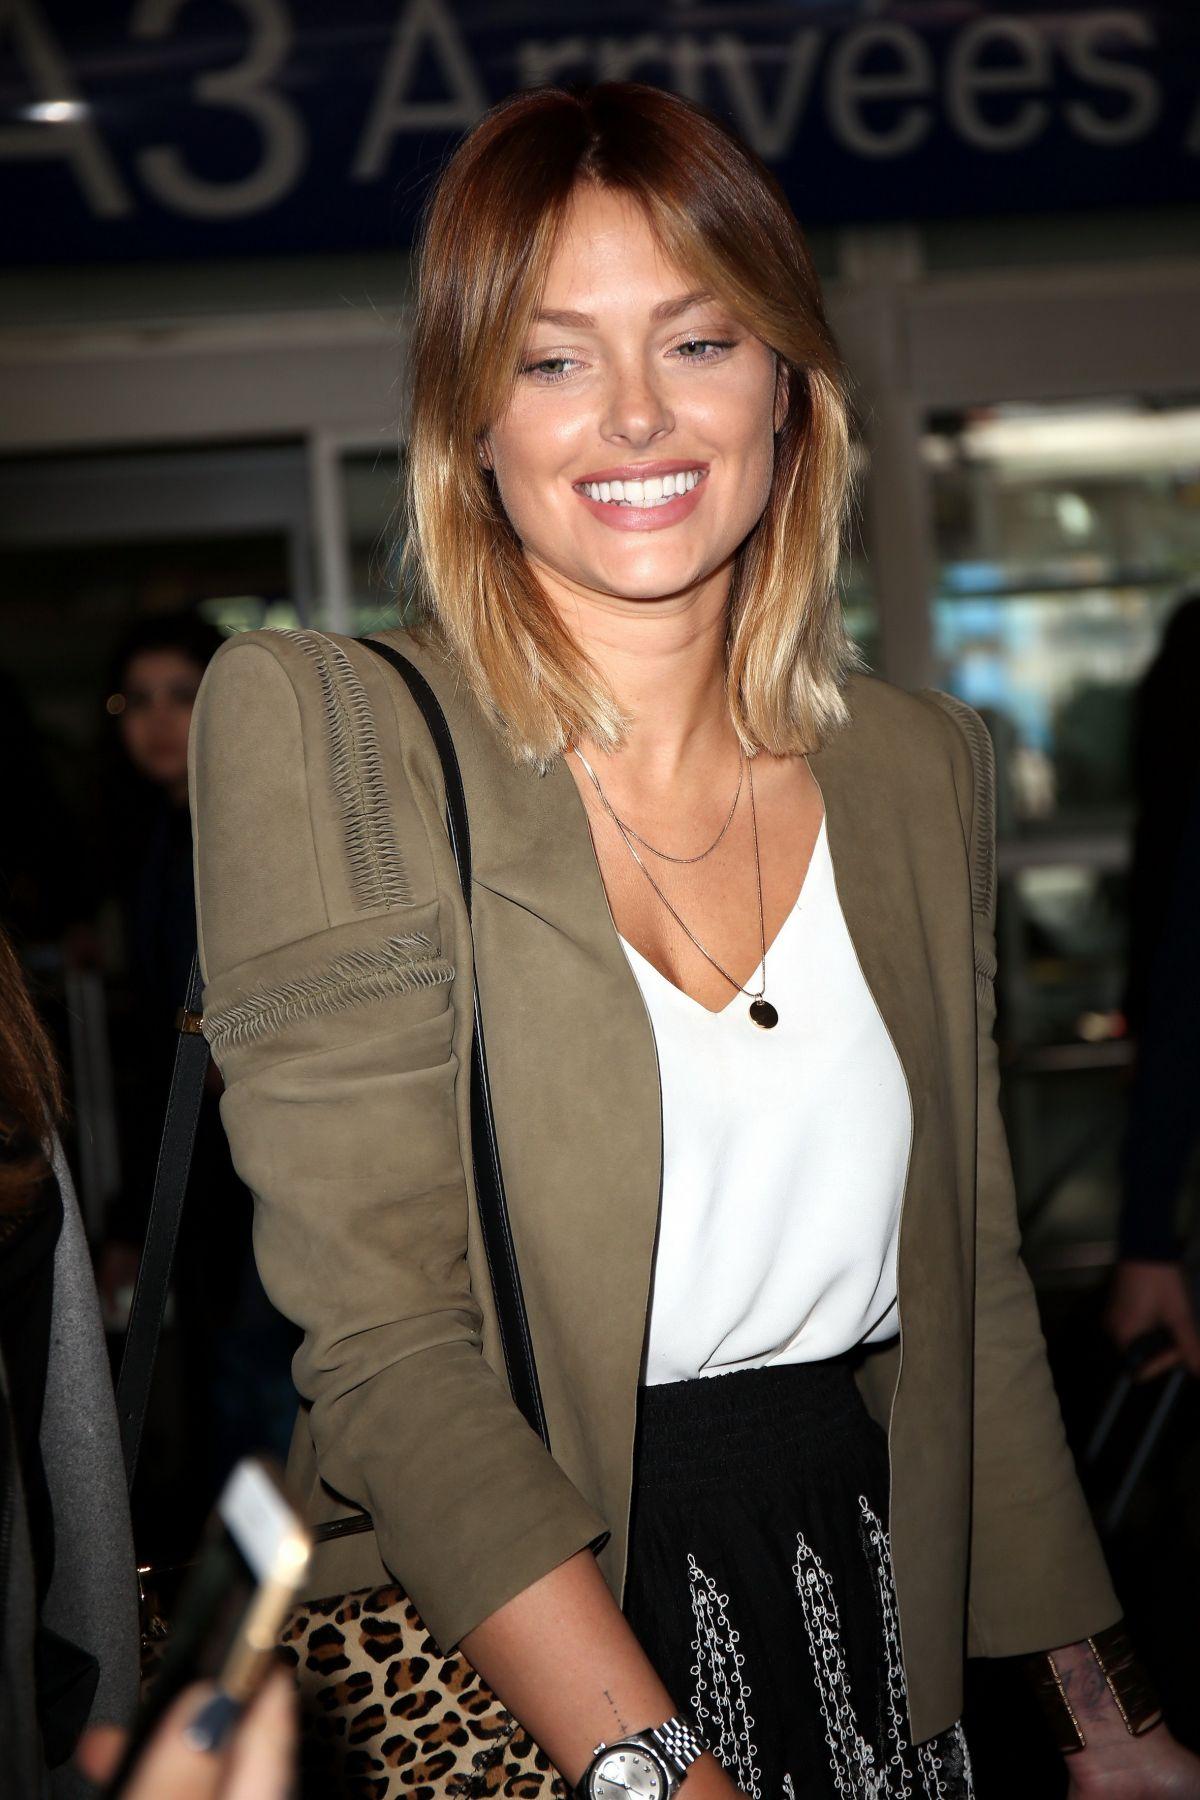 Caroline Receveur At Nice Airport 05 13 2016 Hawtcelebs